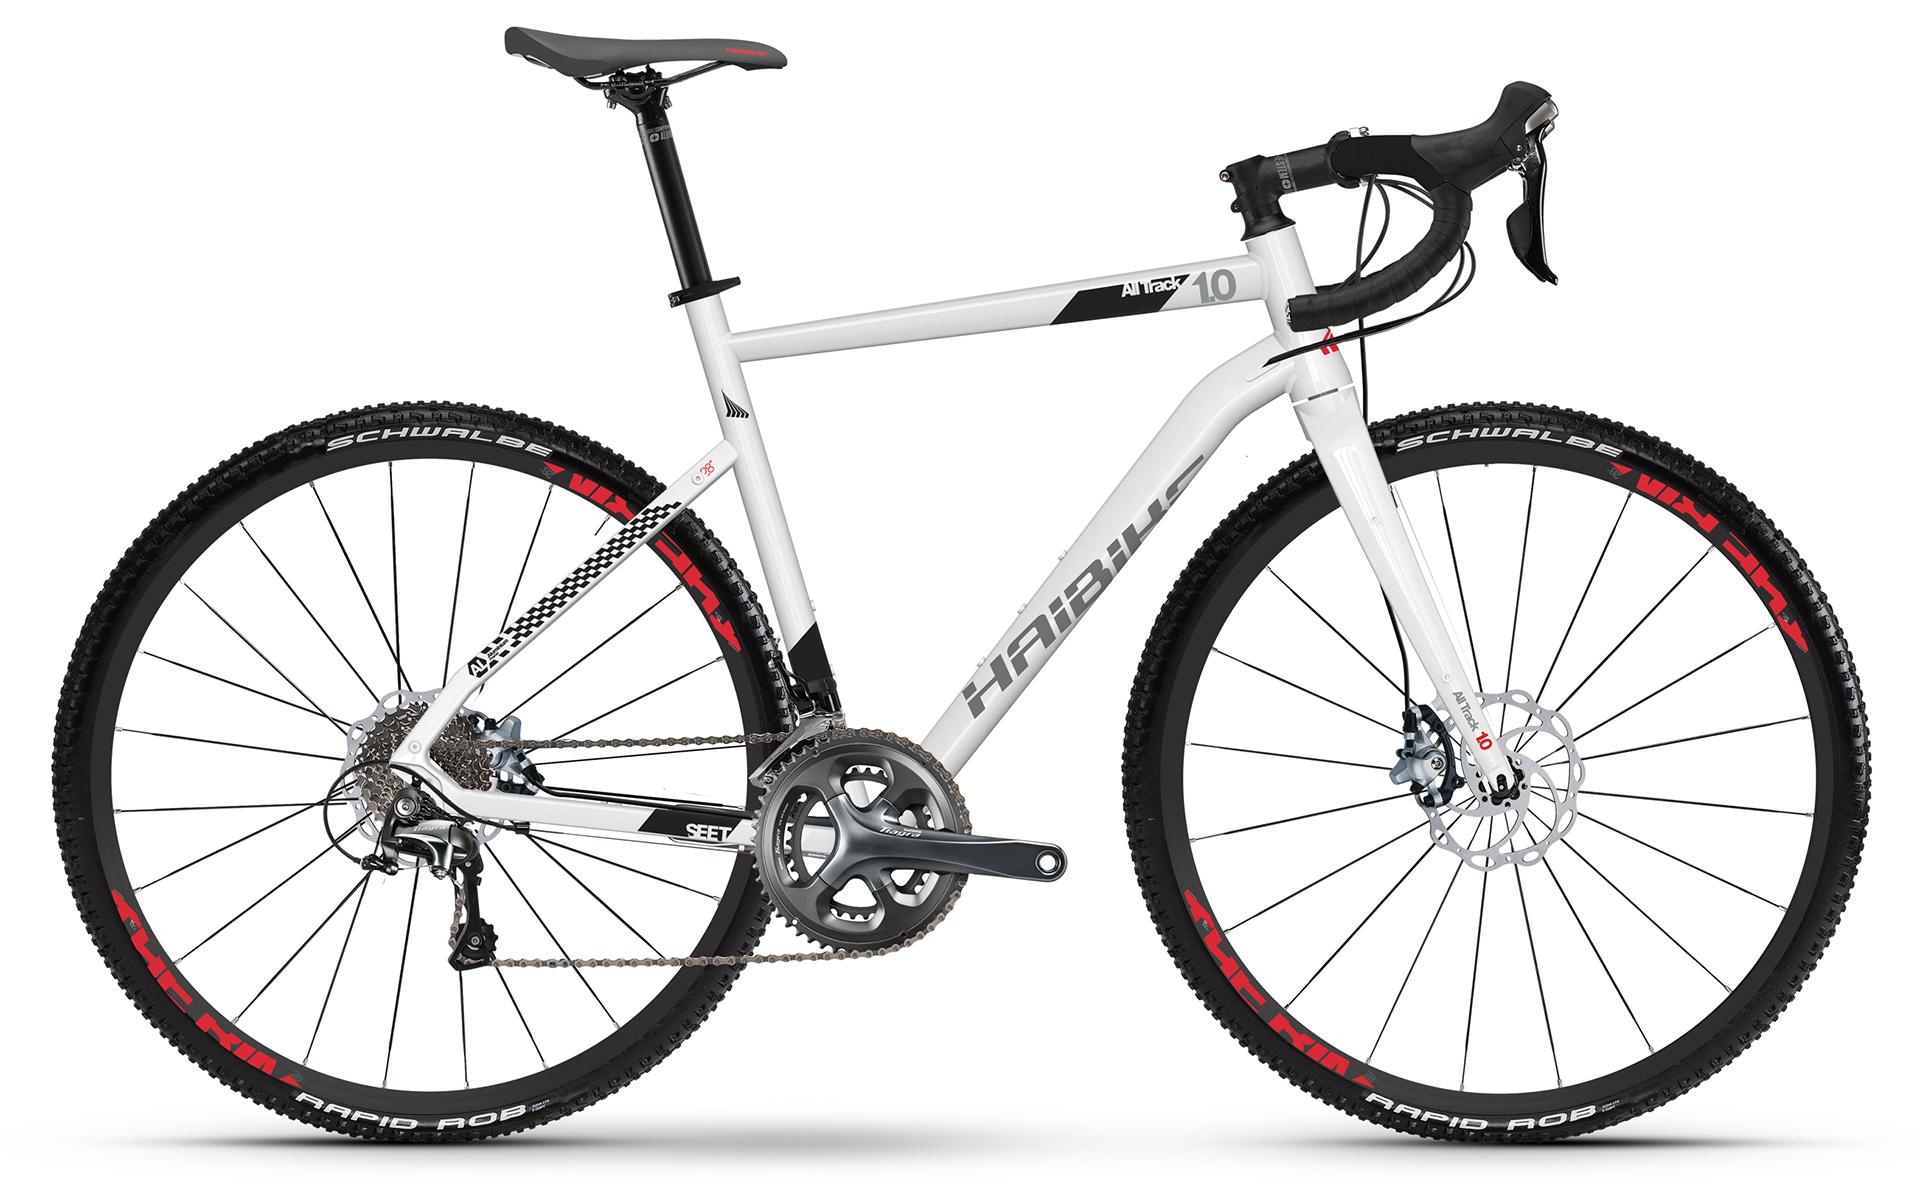 Haibike Seet AllTrack 1.0 Gravel Bike Shimano Tiagra 10S